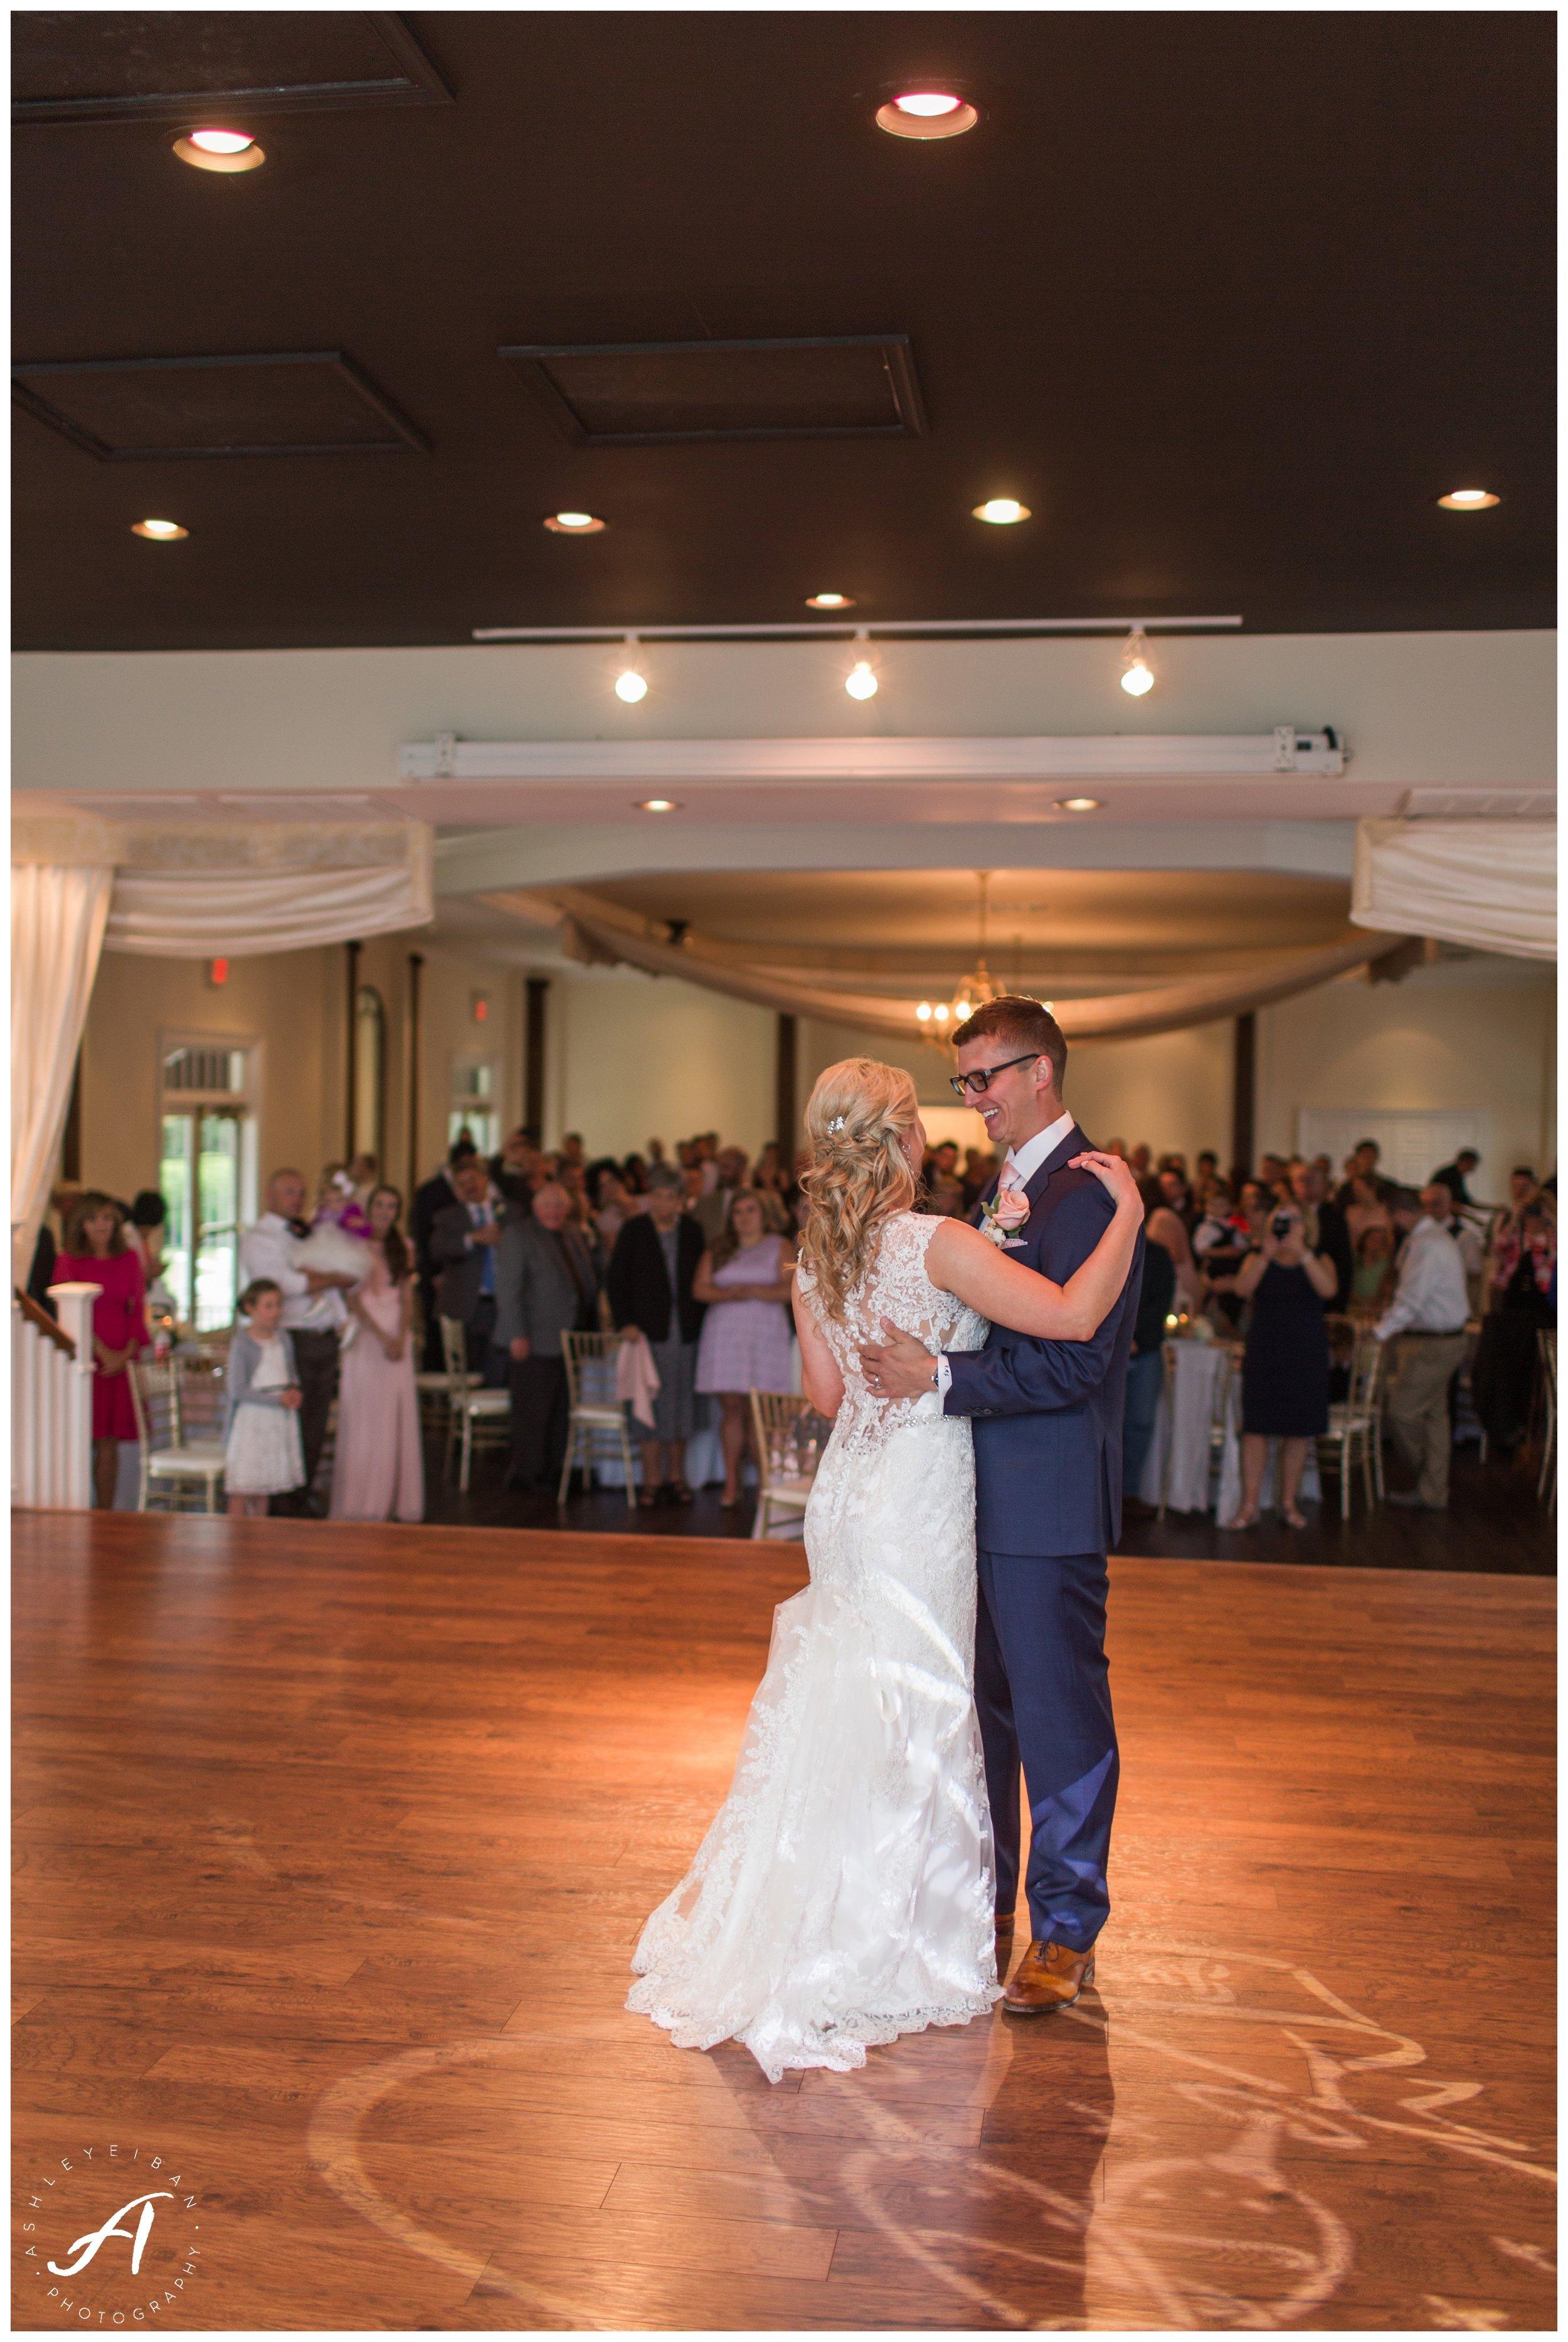 First Look moments || Spring Trivium Estate Wedding || blush and navy wedding || Ashley Eiban Photography || www.ashleyeiban.com